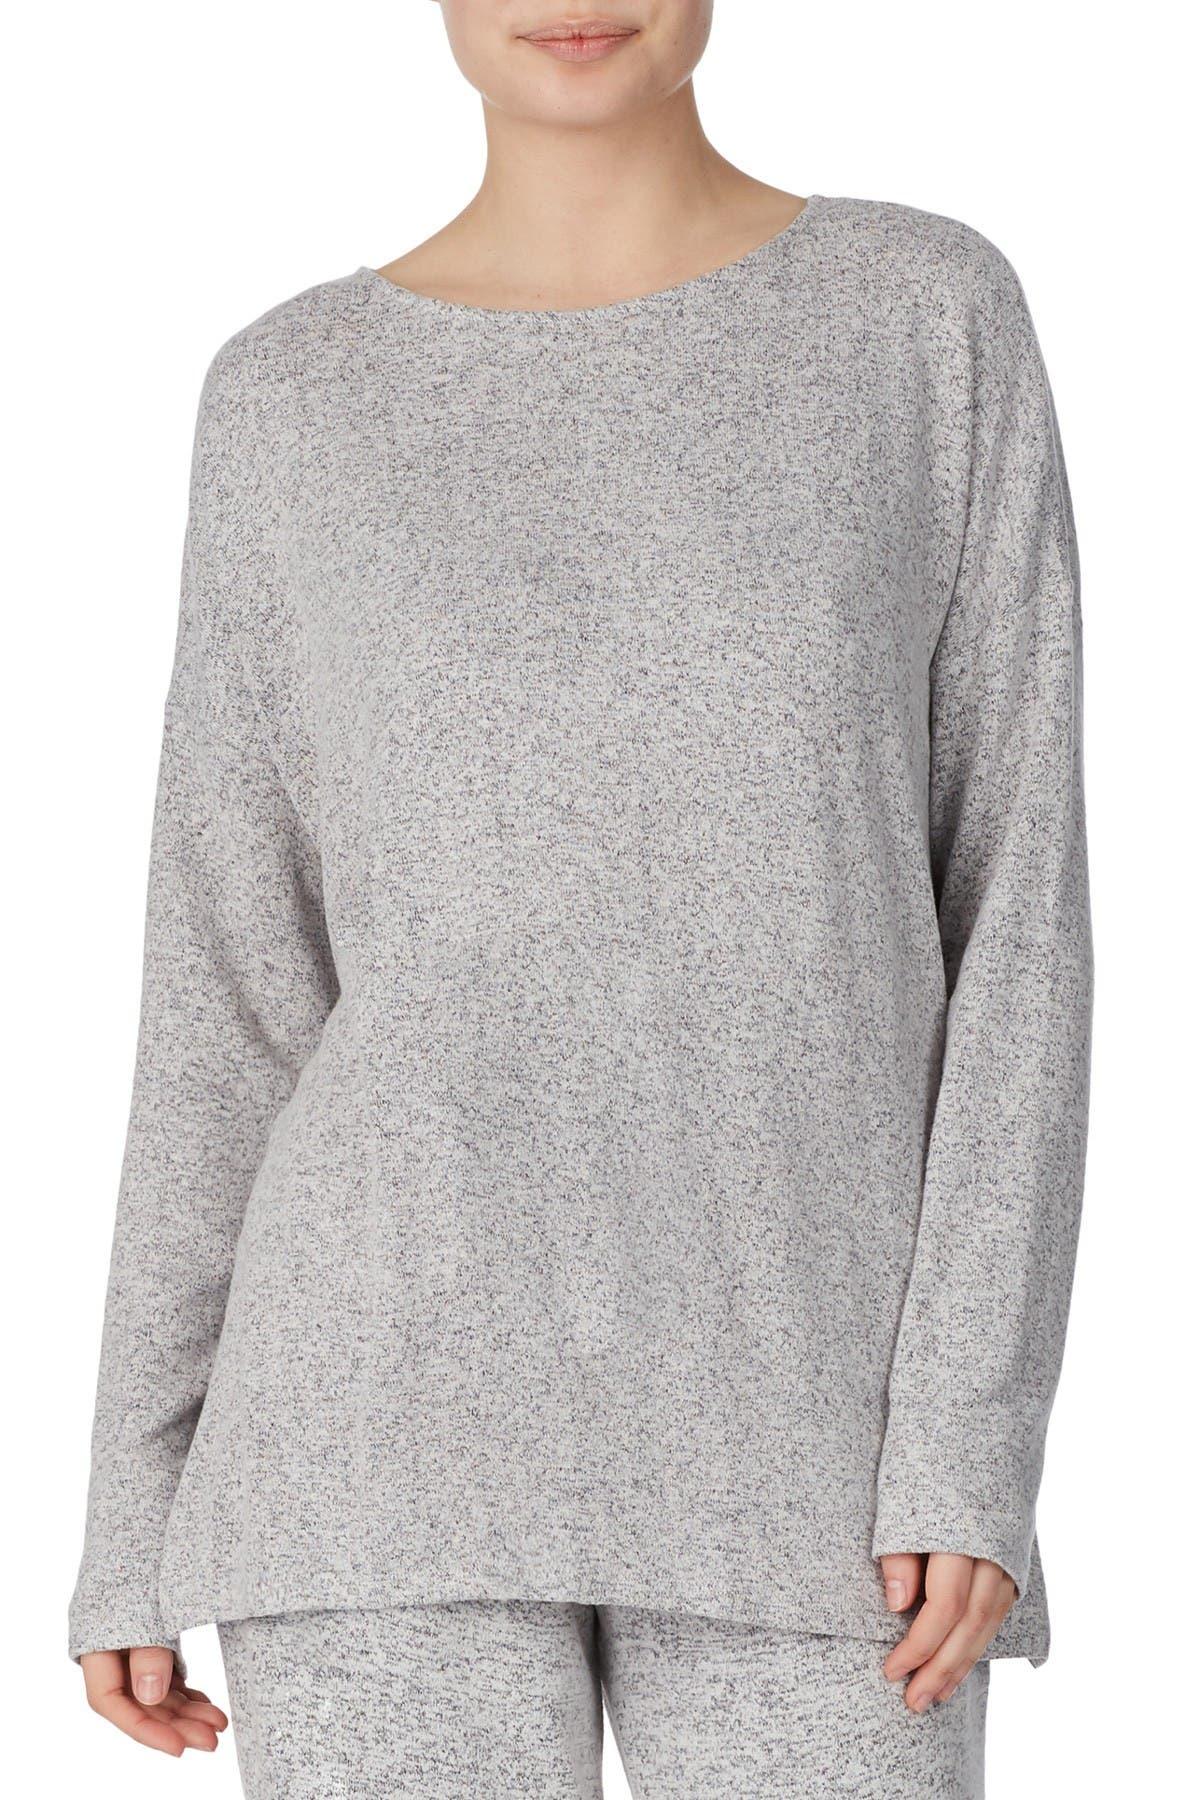 Image of Donna Karan Heathered Knit Lounge Pullover